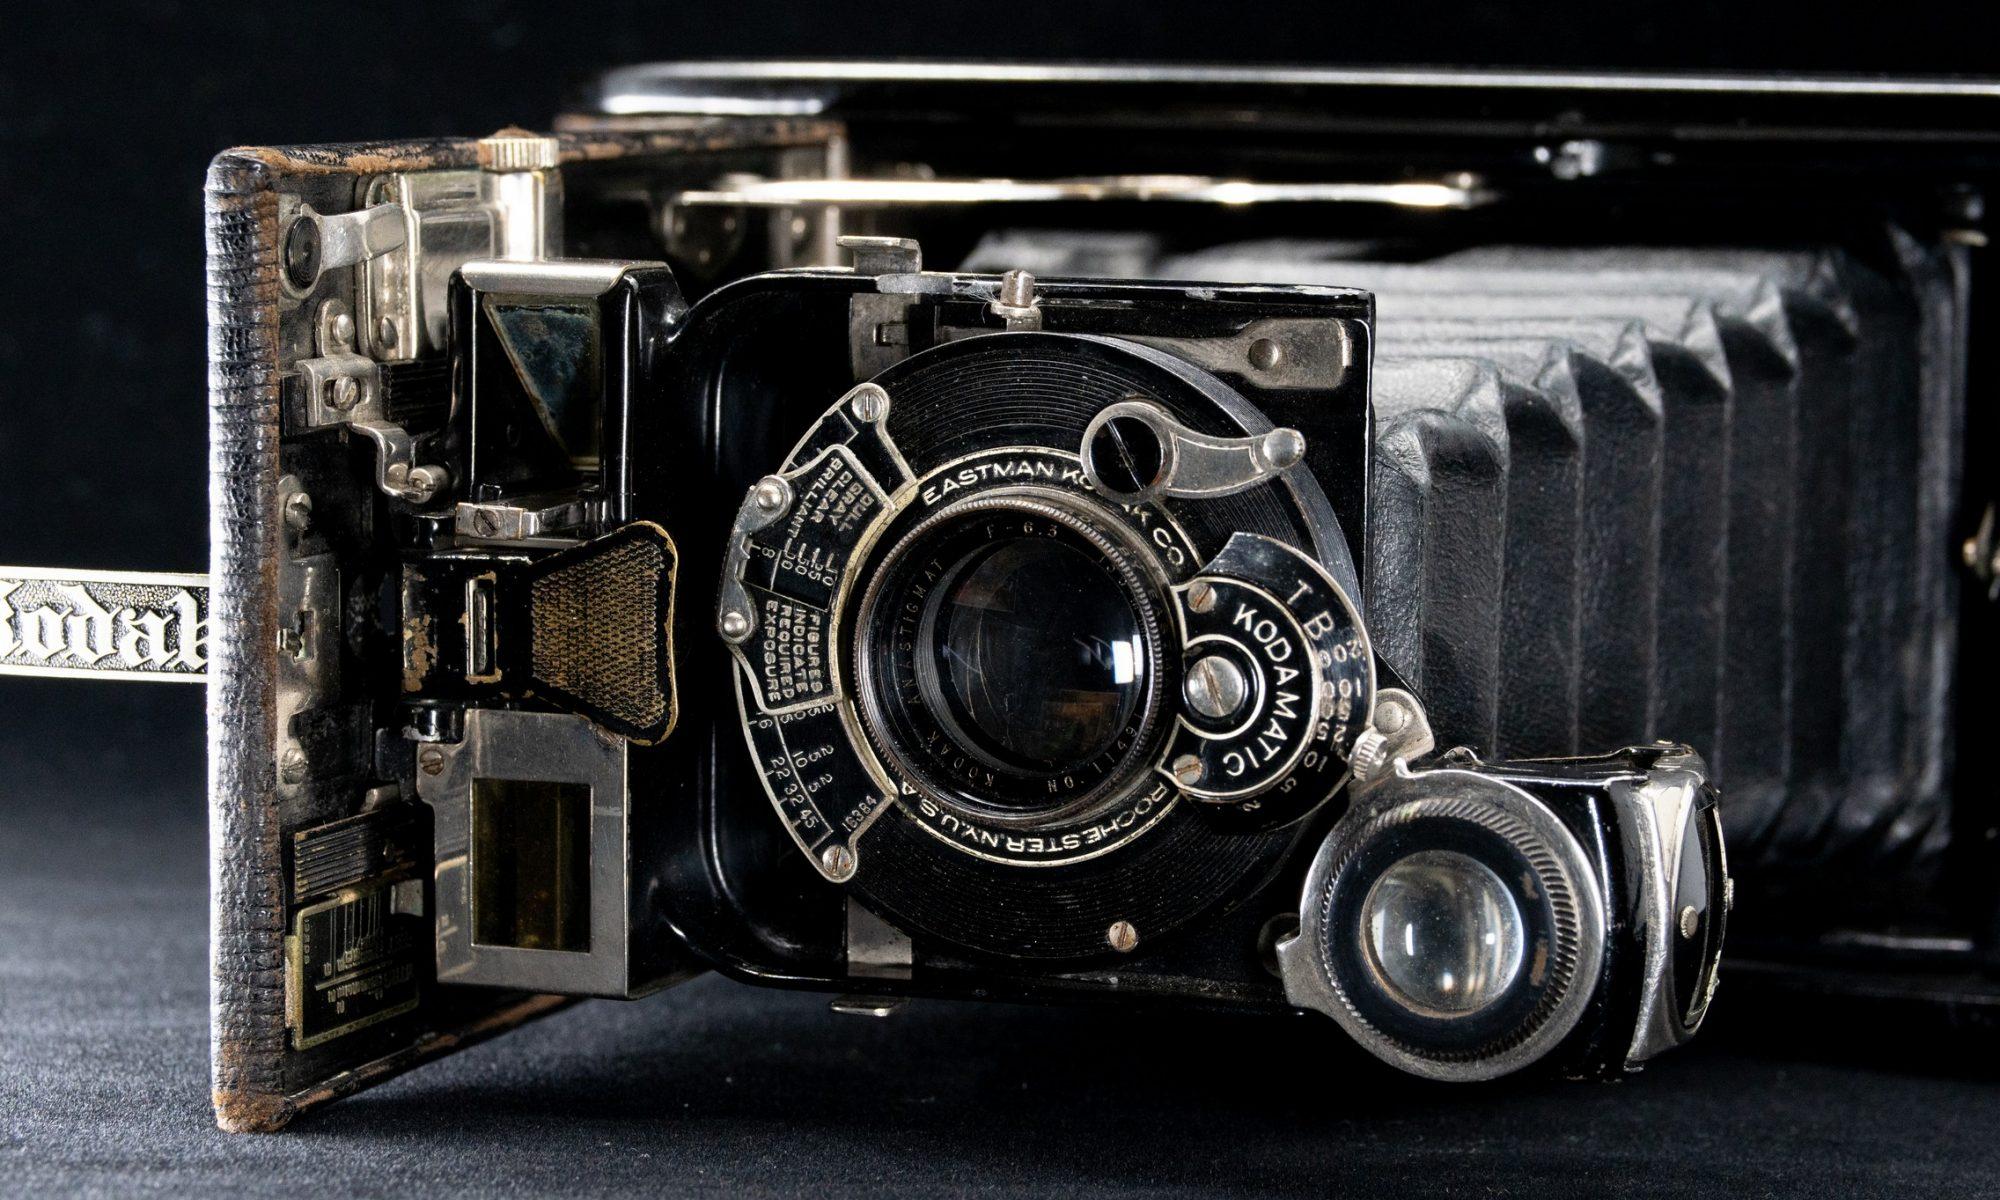 Kodak No. 3A Autographic Special